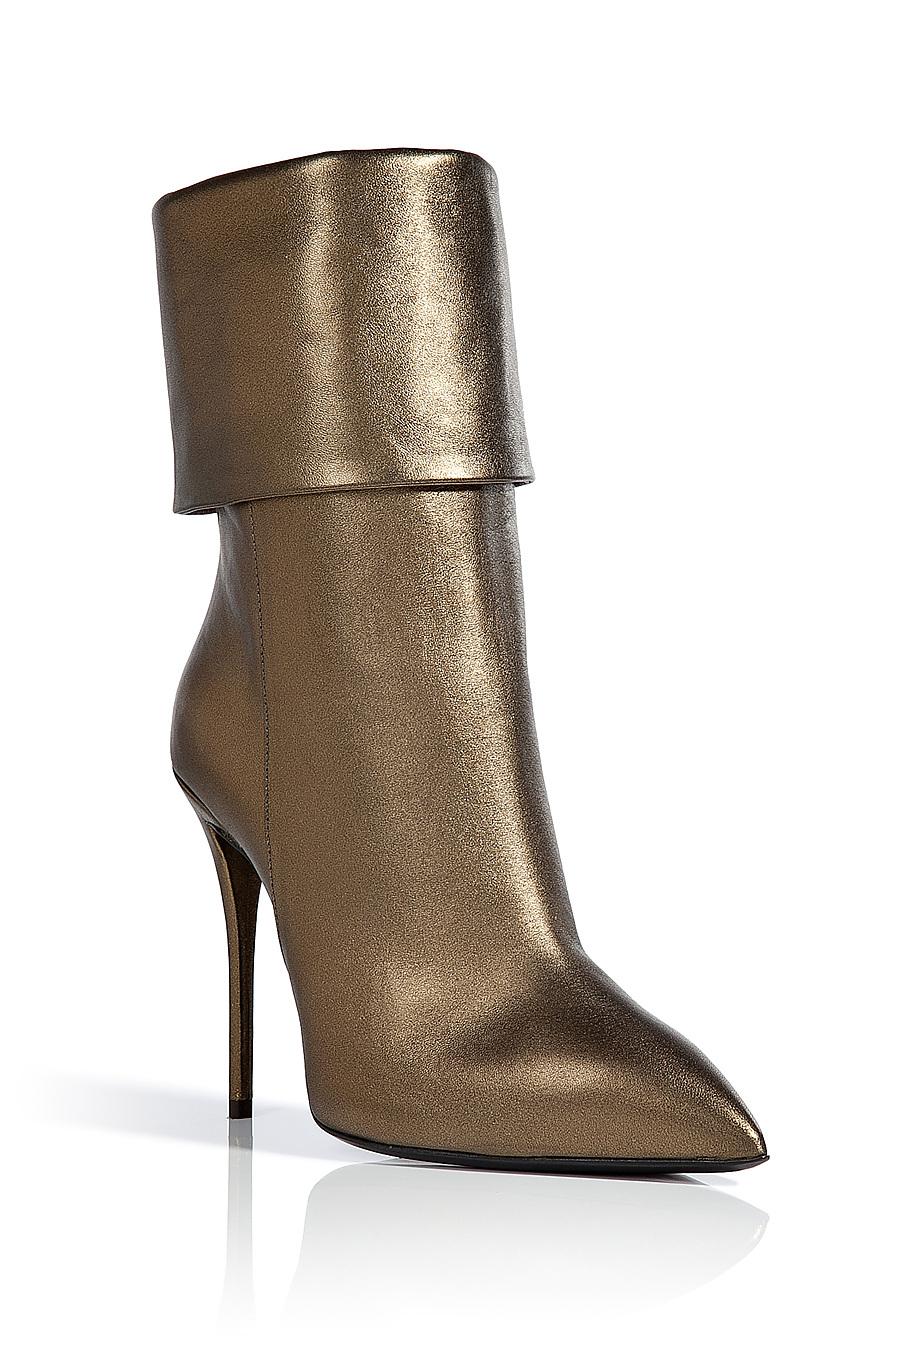 Giuseppe Zanotti Metallic Leather Ankle Boots In Bronze